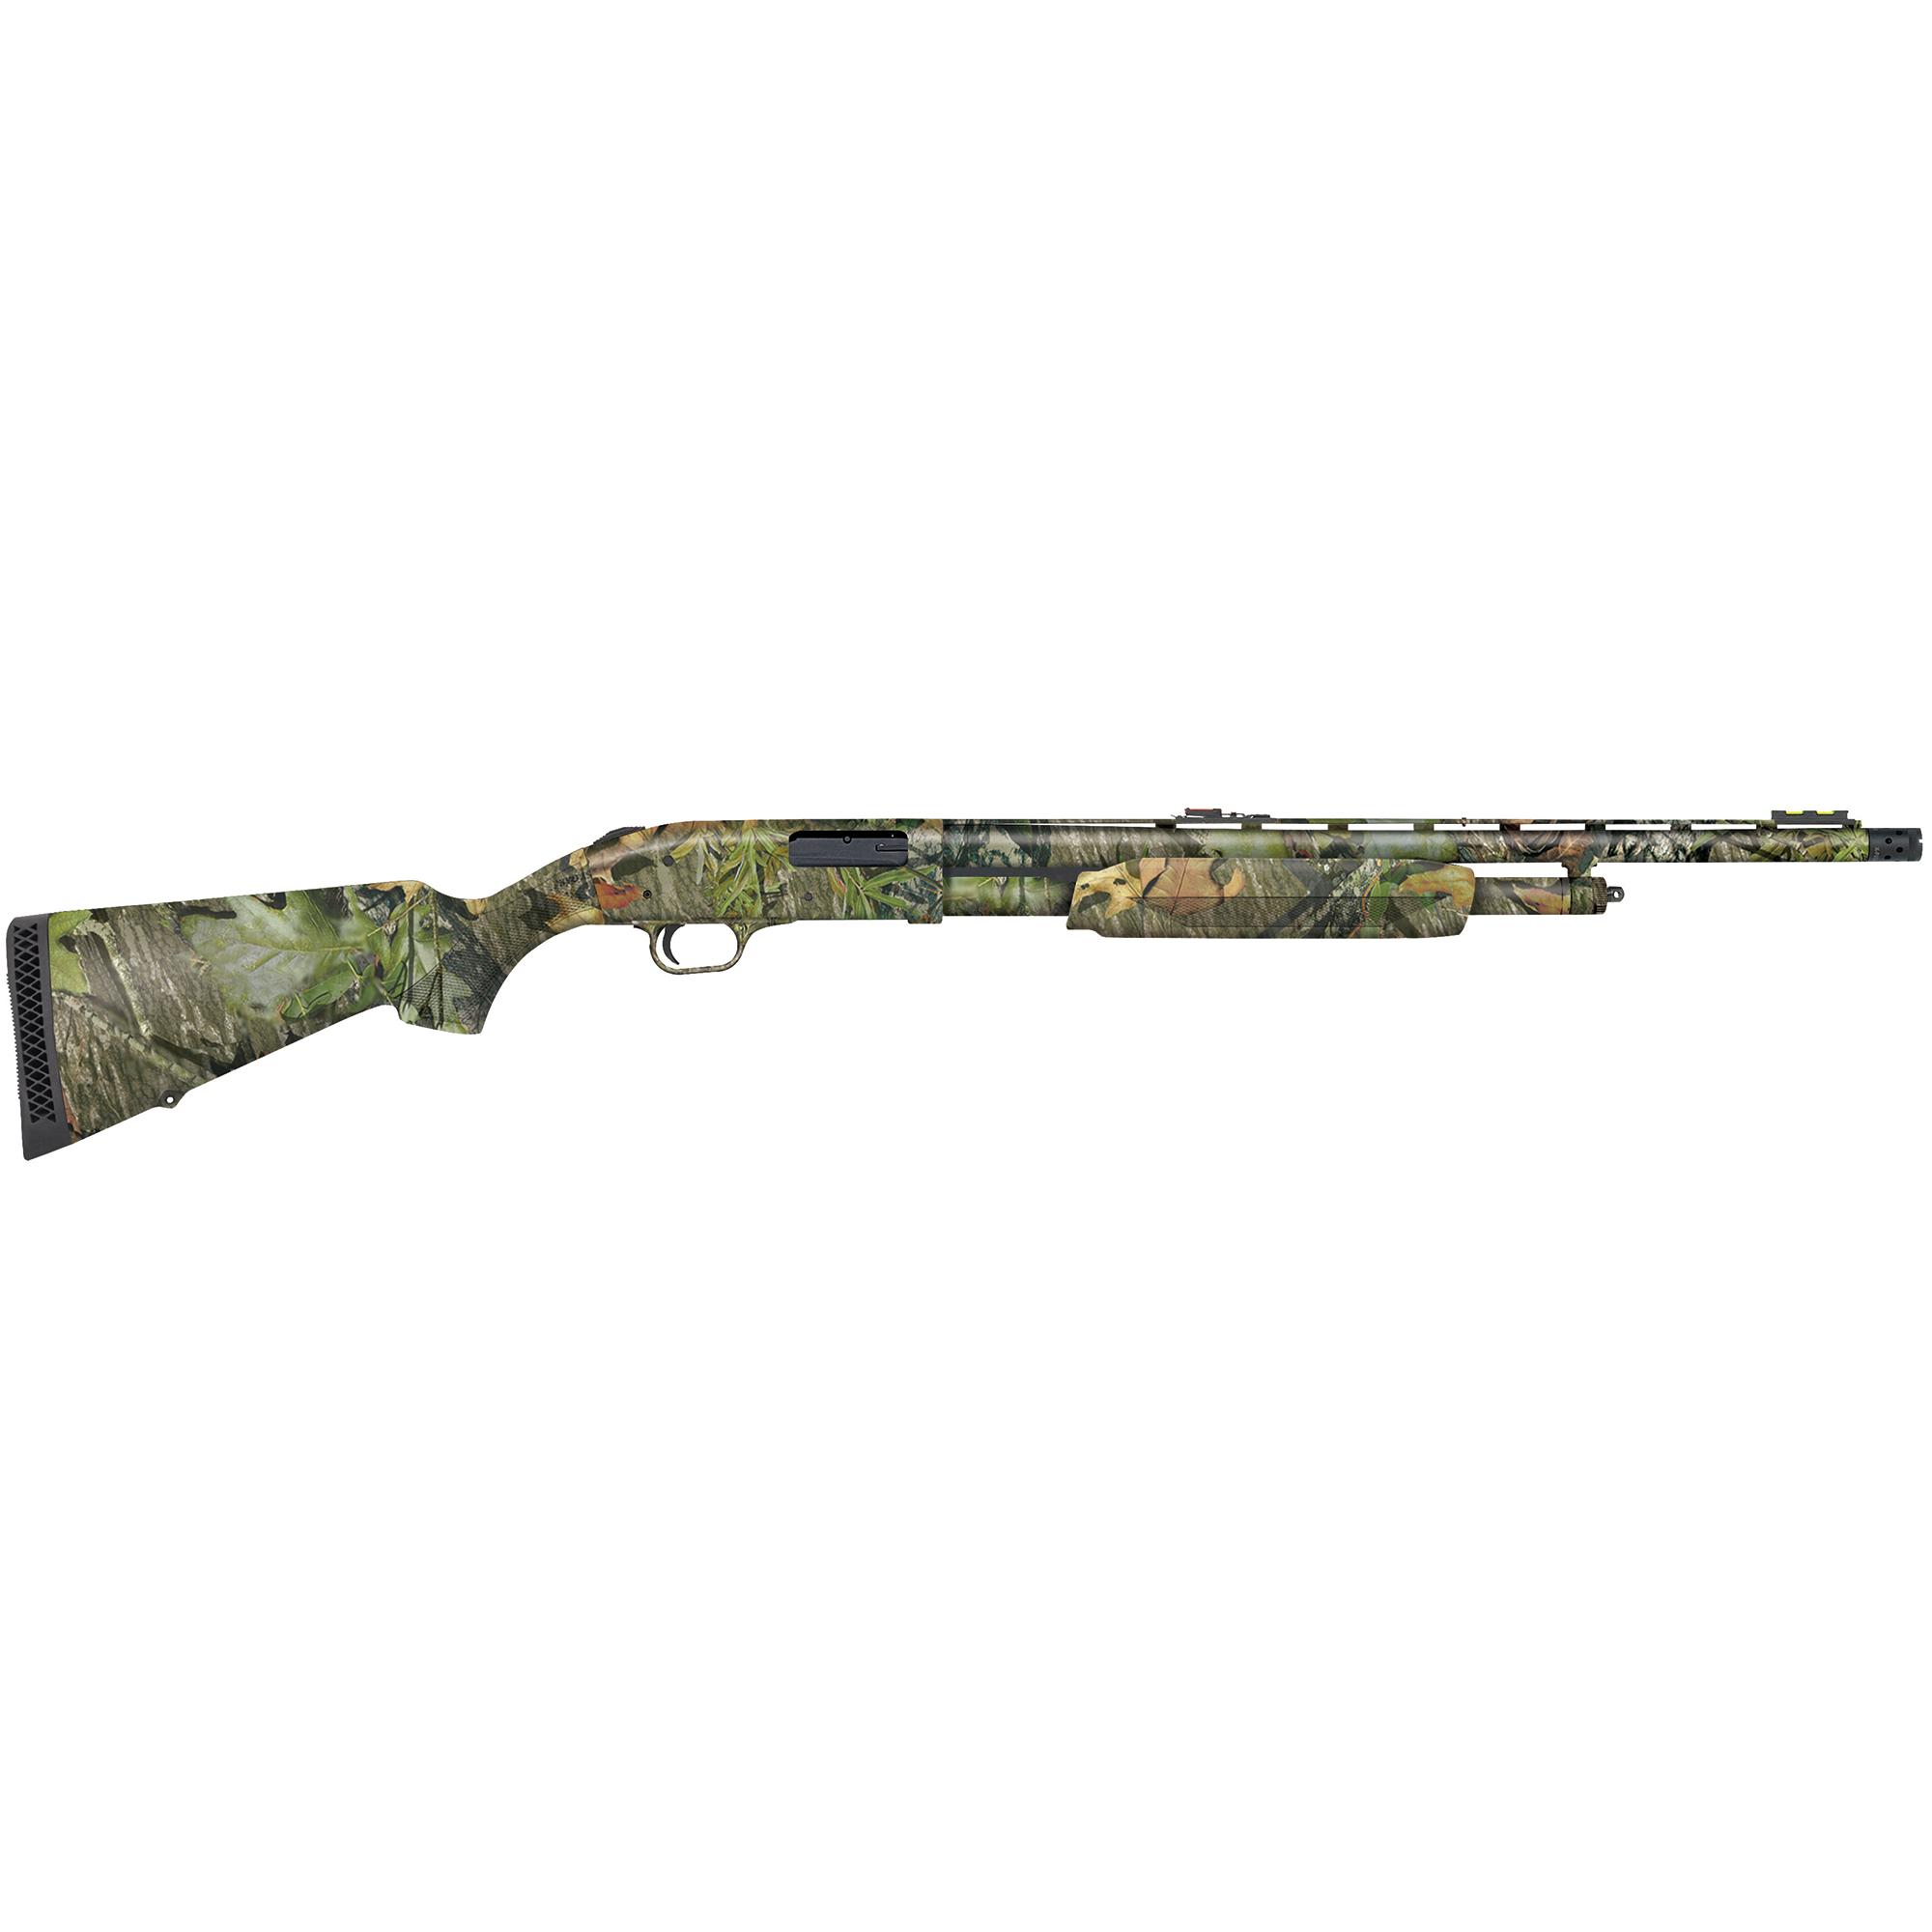 Mossberg 500 Turkey Shotgun, 20 Ga, Mossy Oak Obsession Camo